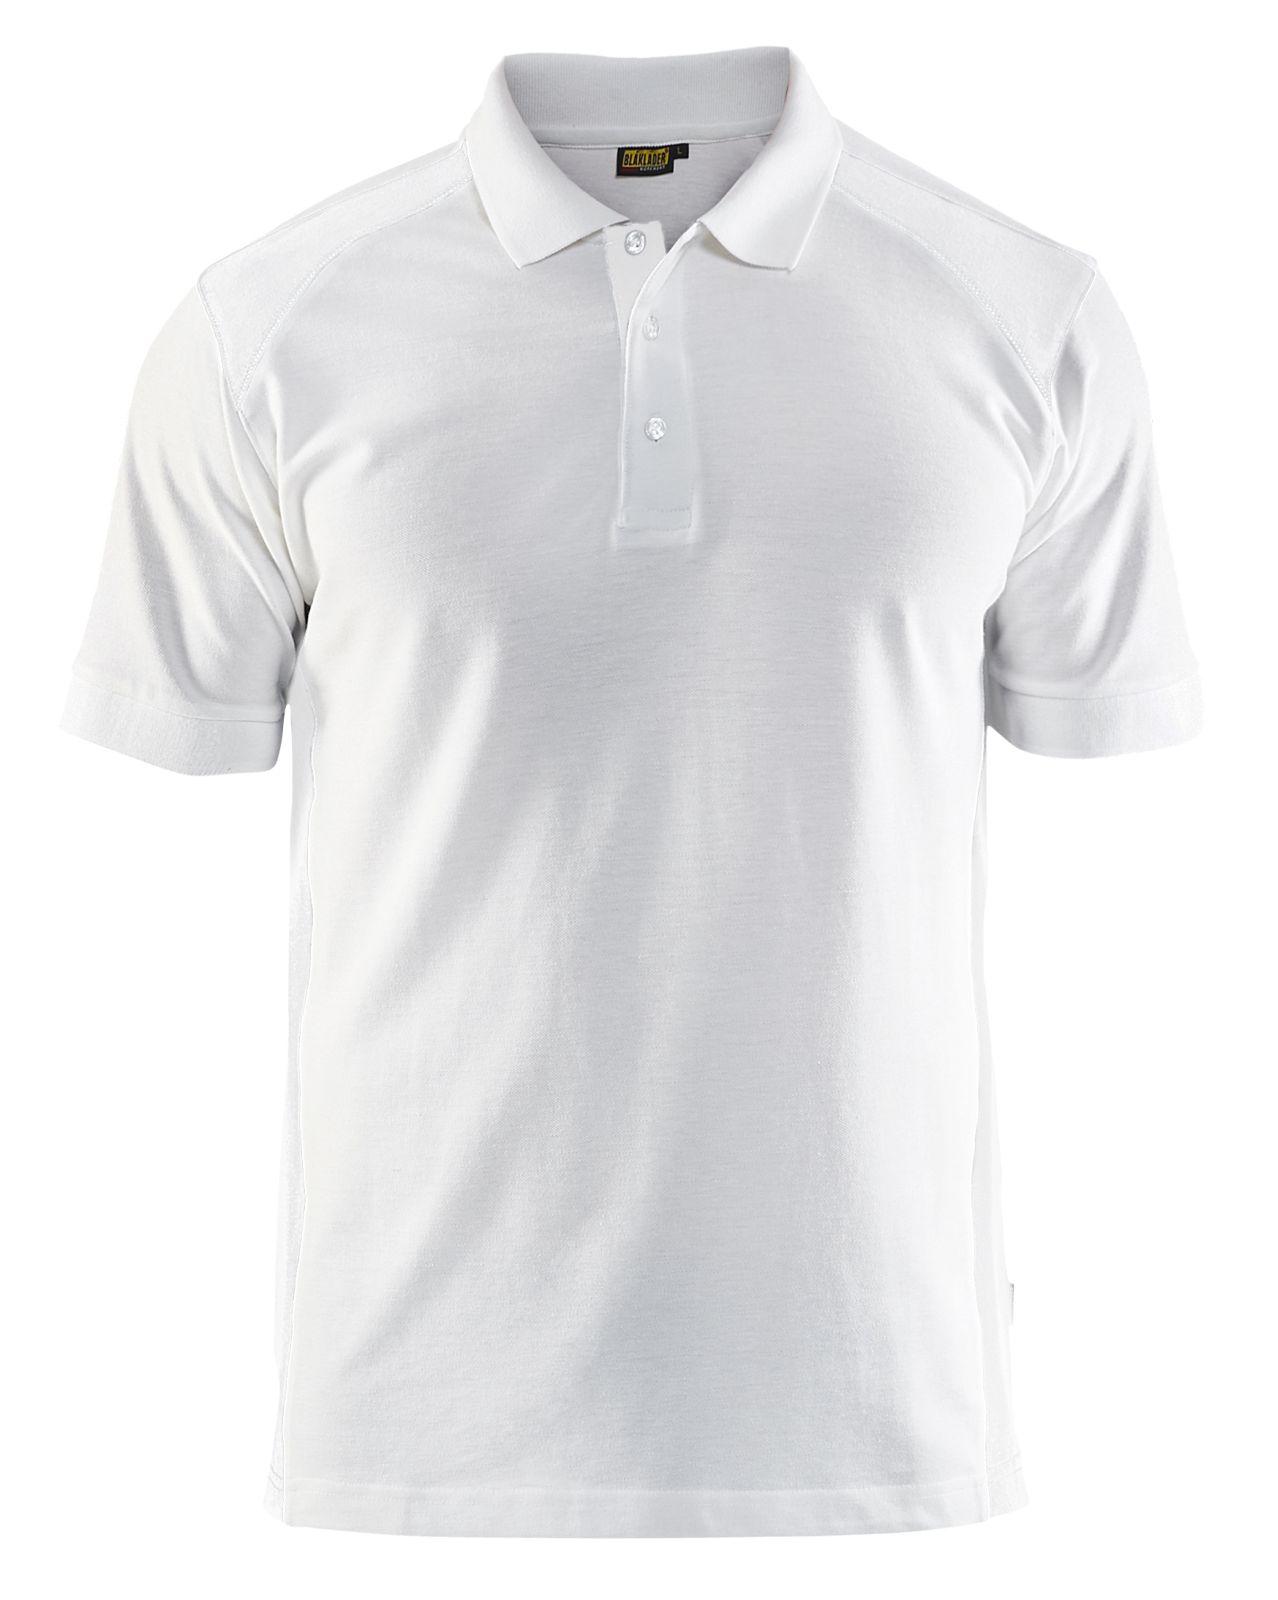 Blaklader Poloshirts 33241050 wit(1000)